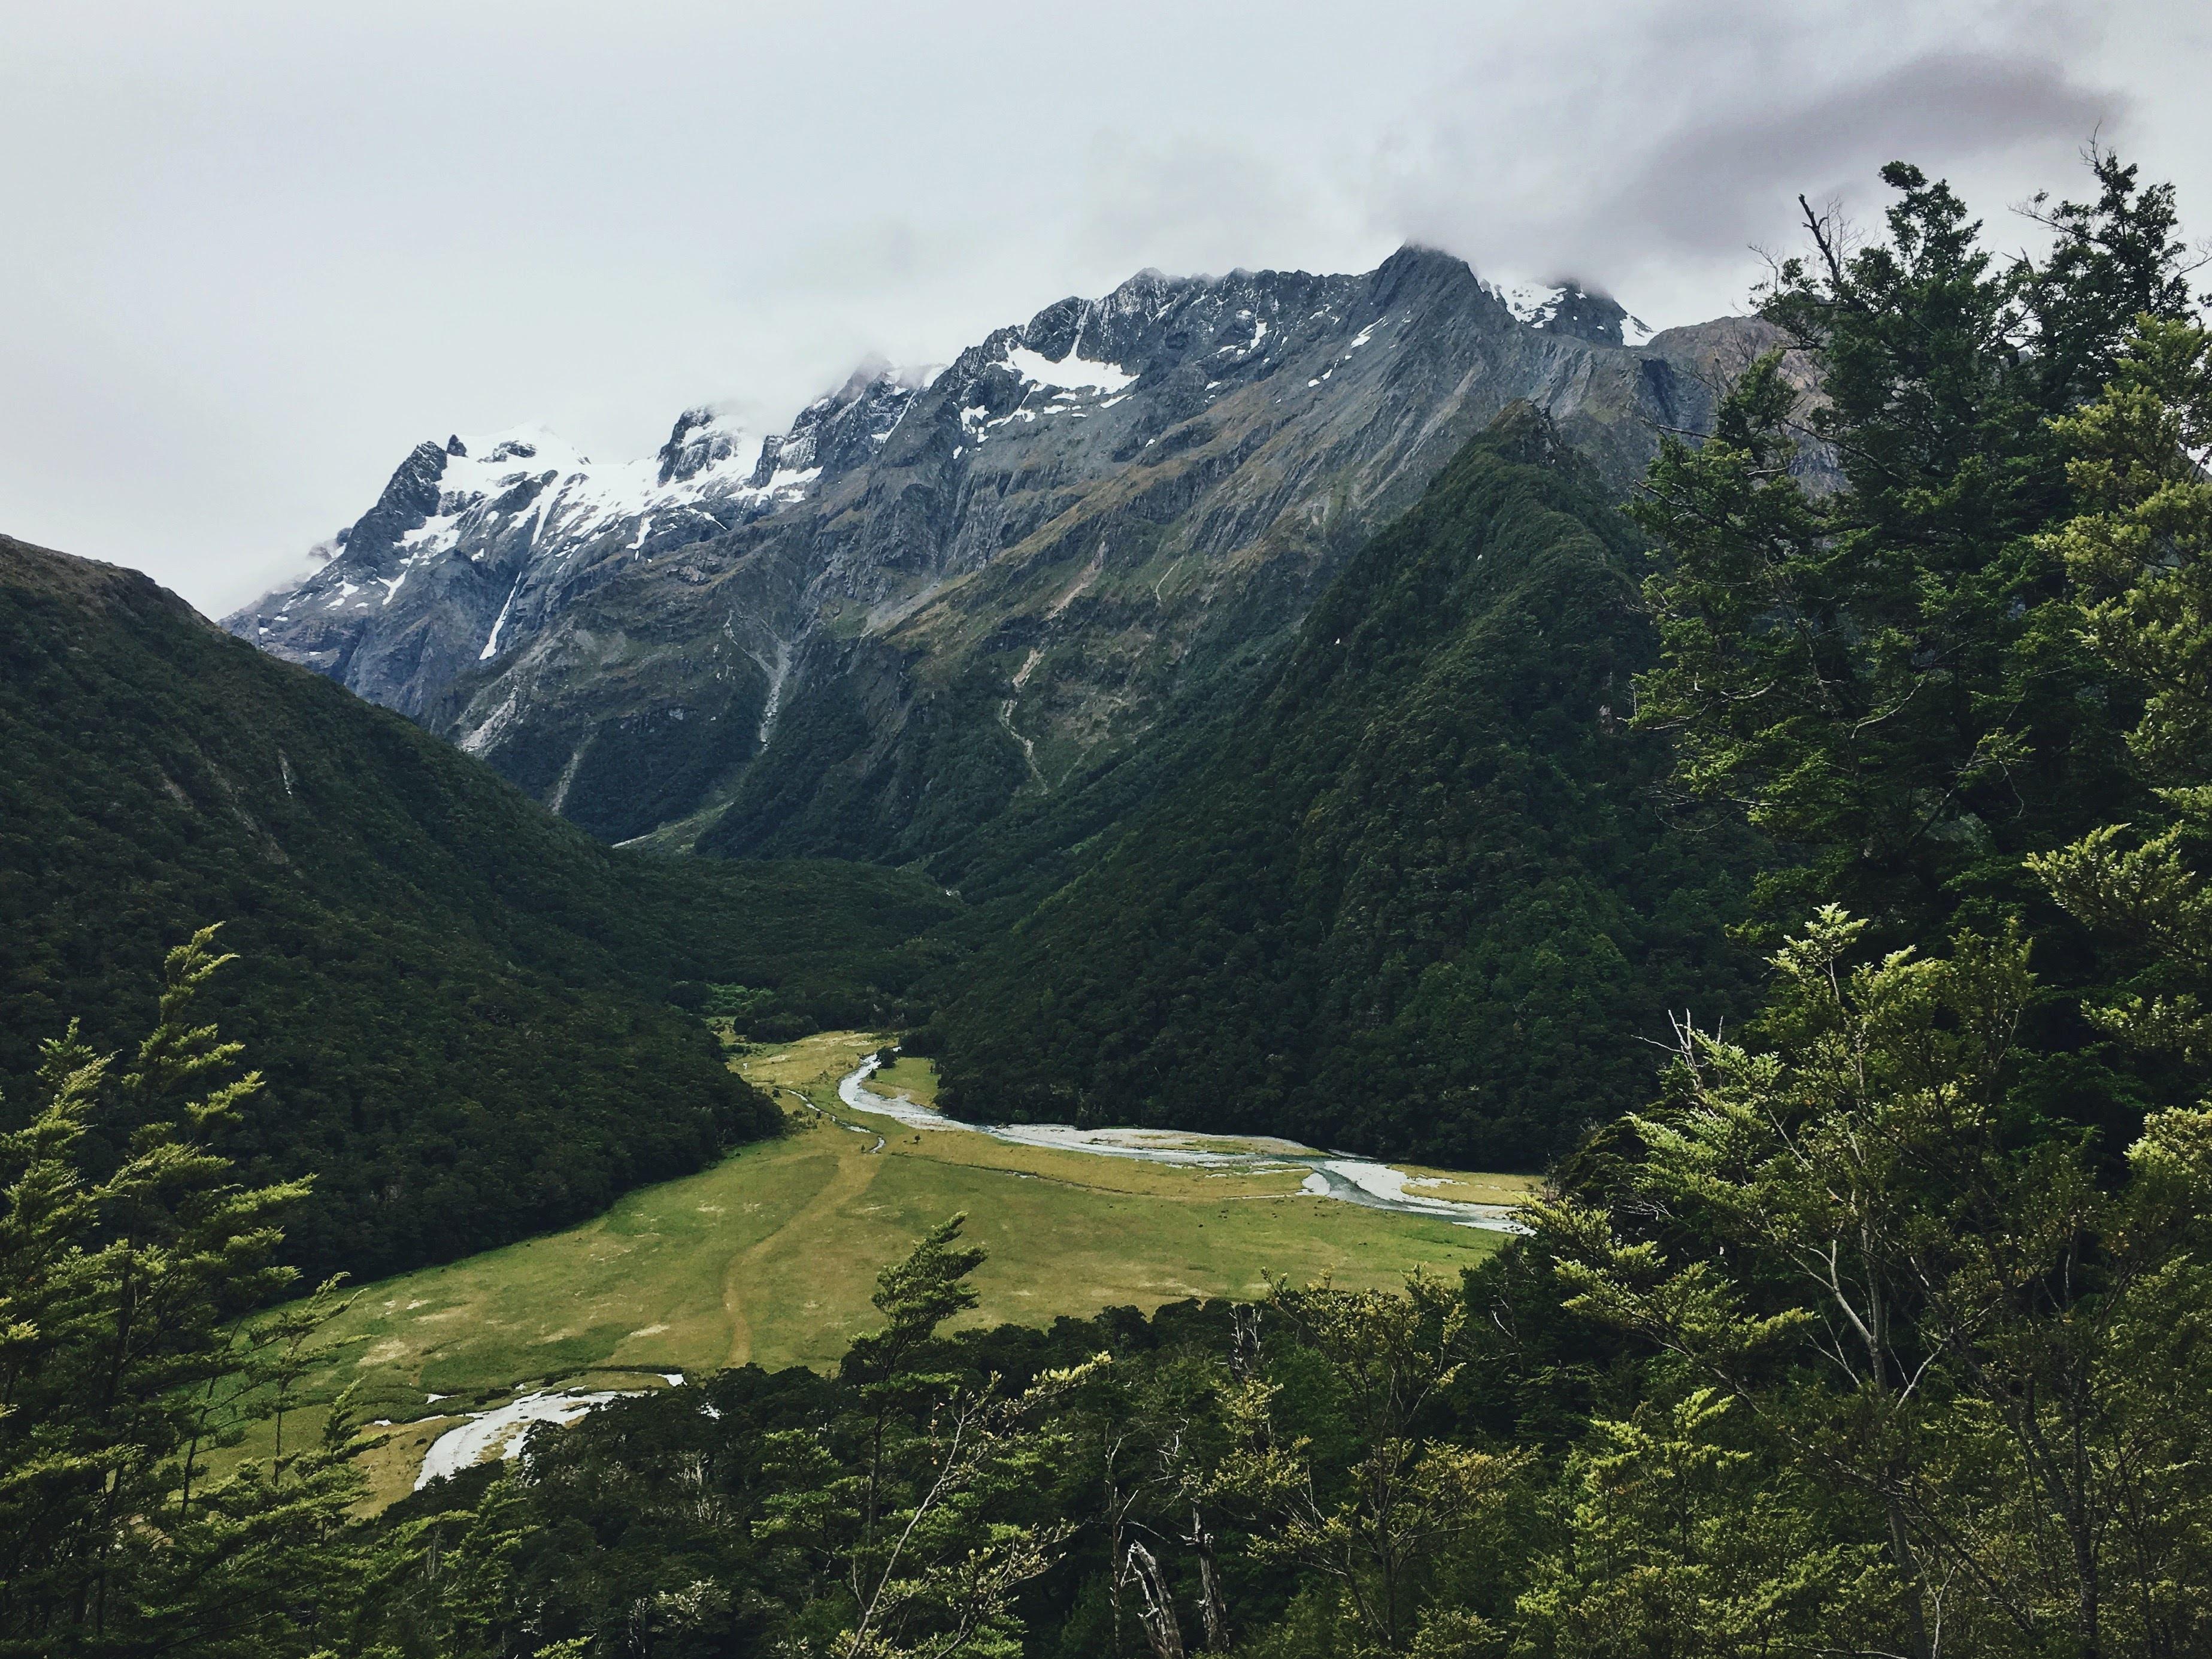 panoramic photography of mountain